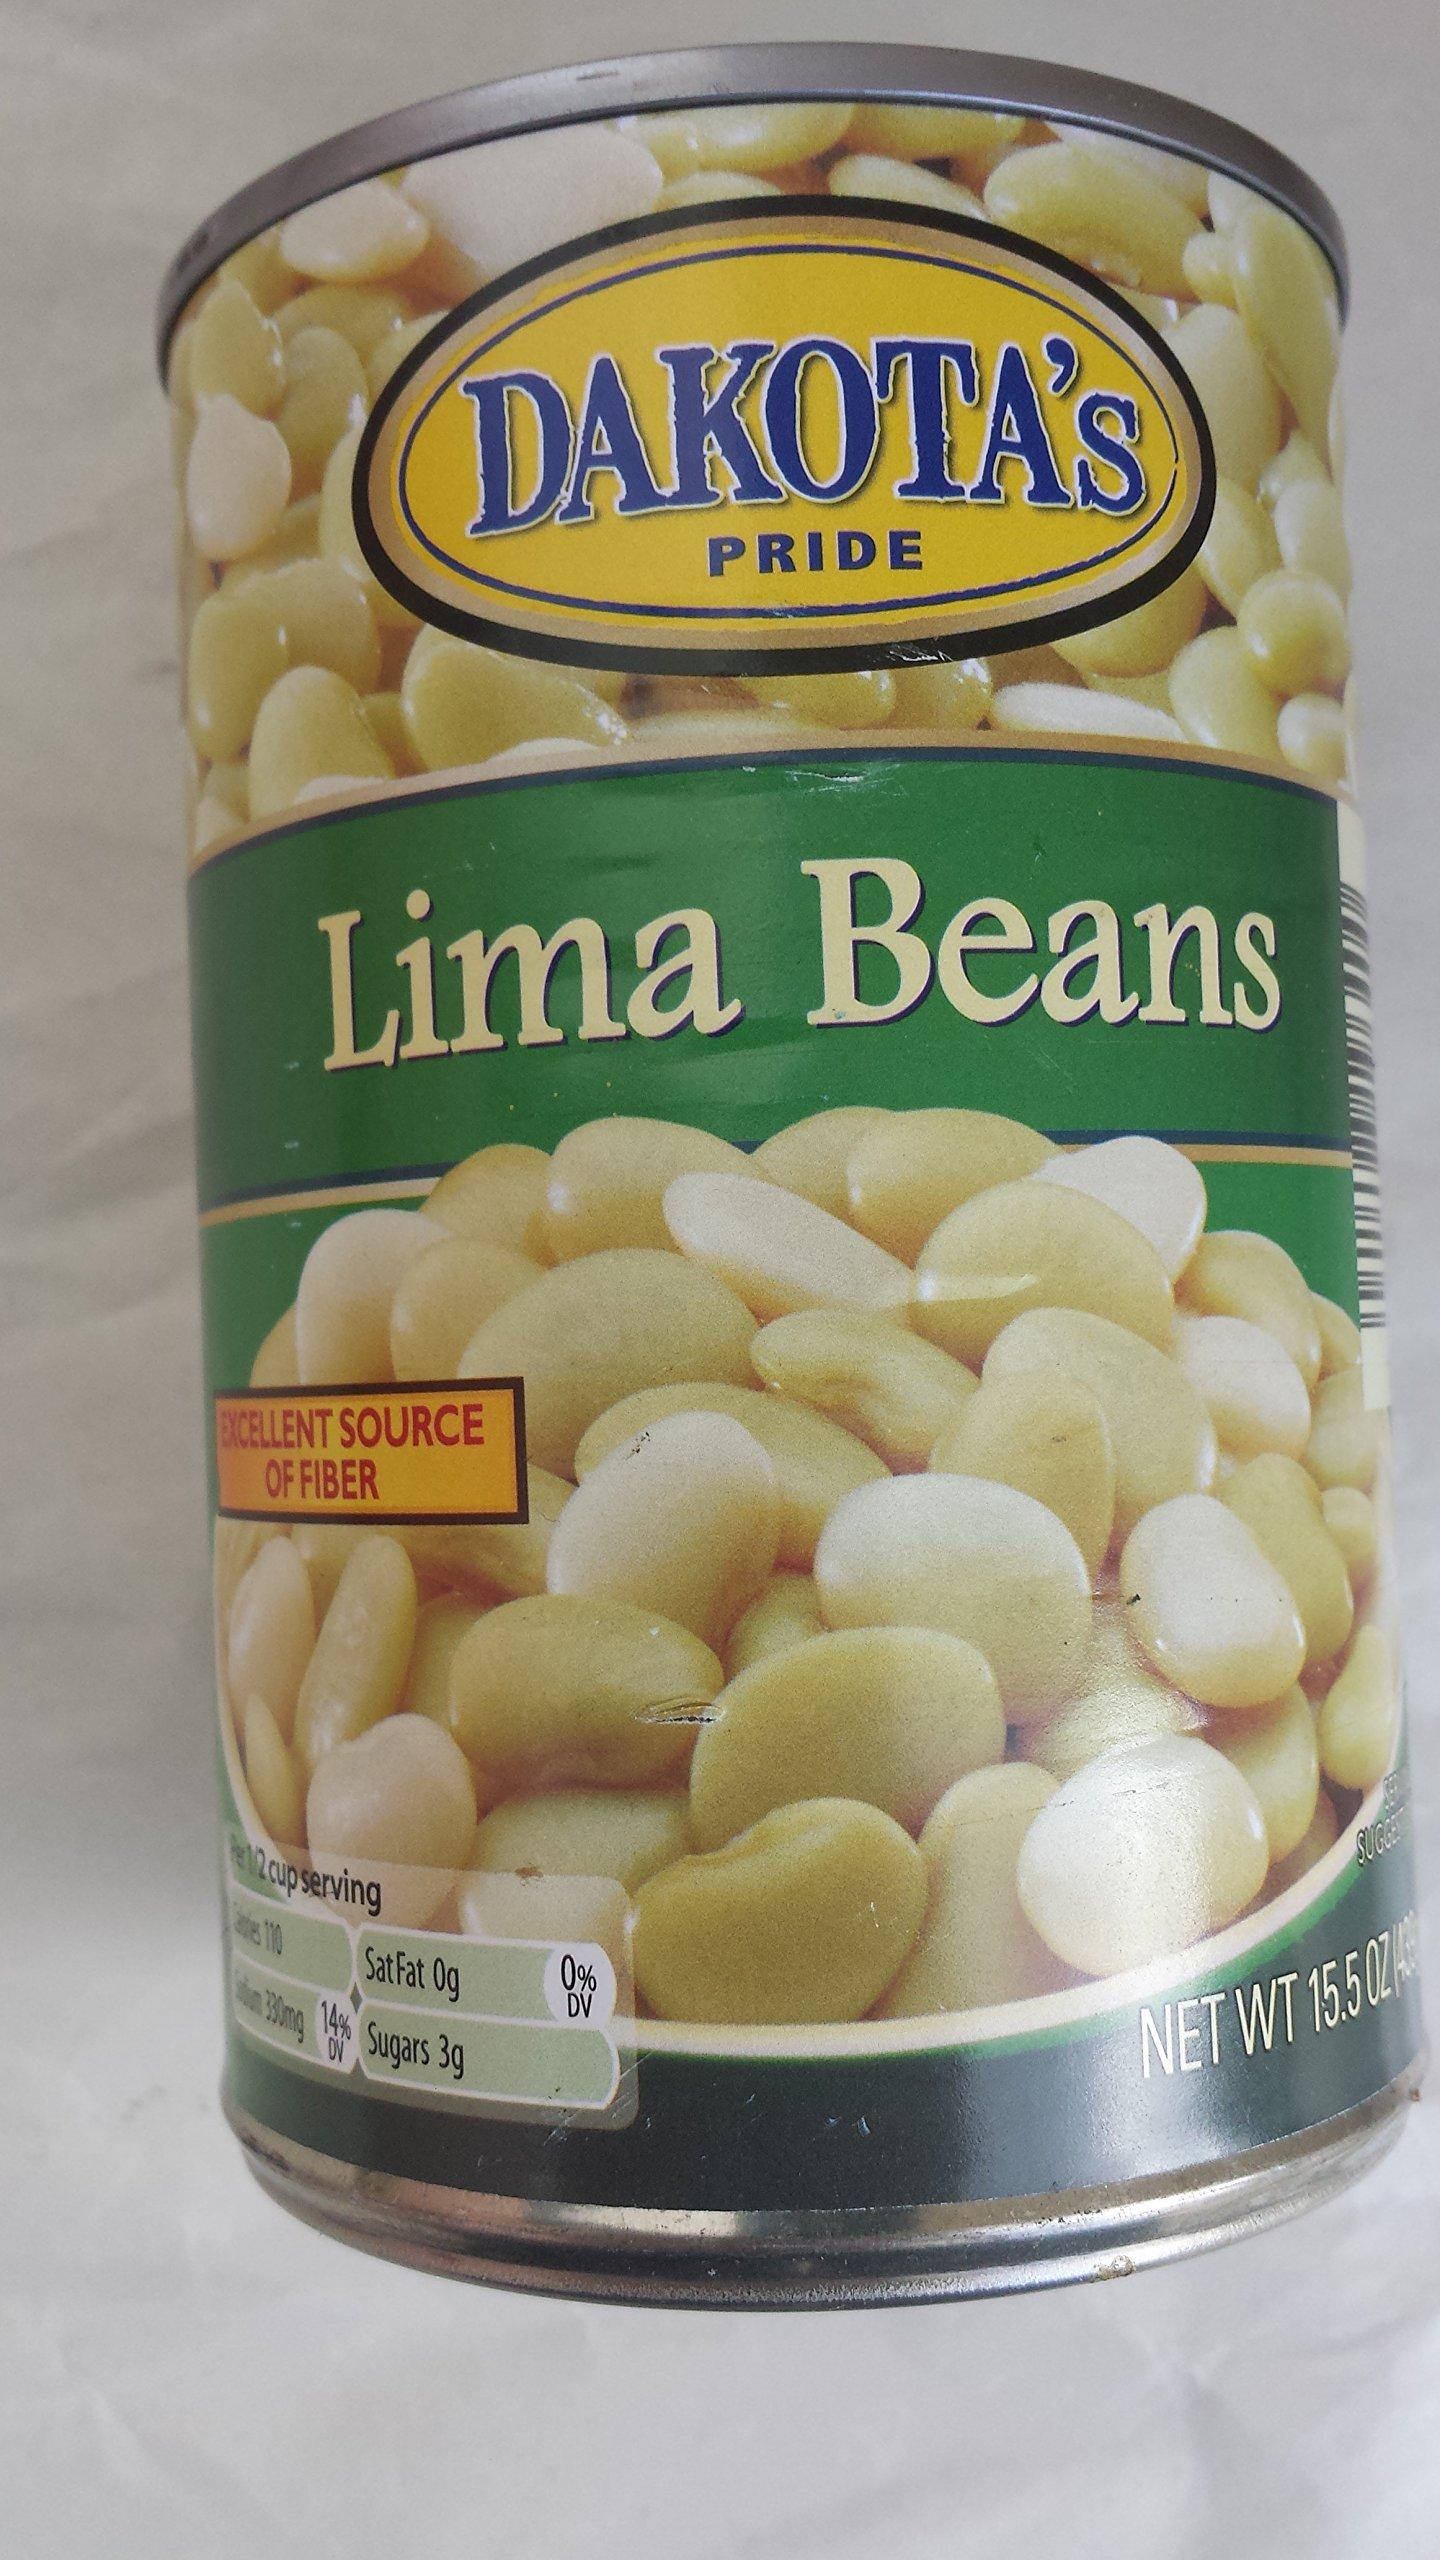 Dakota's Pride Lima Beans 15.5 Oz Can